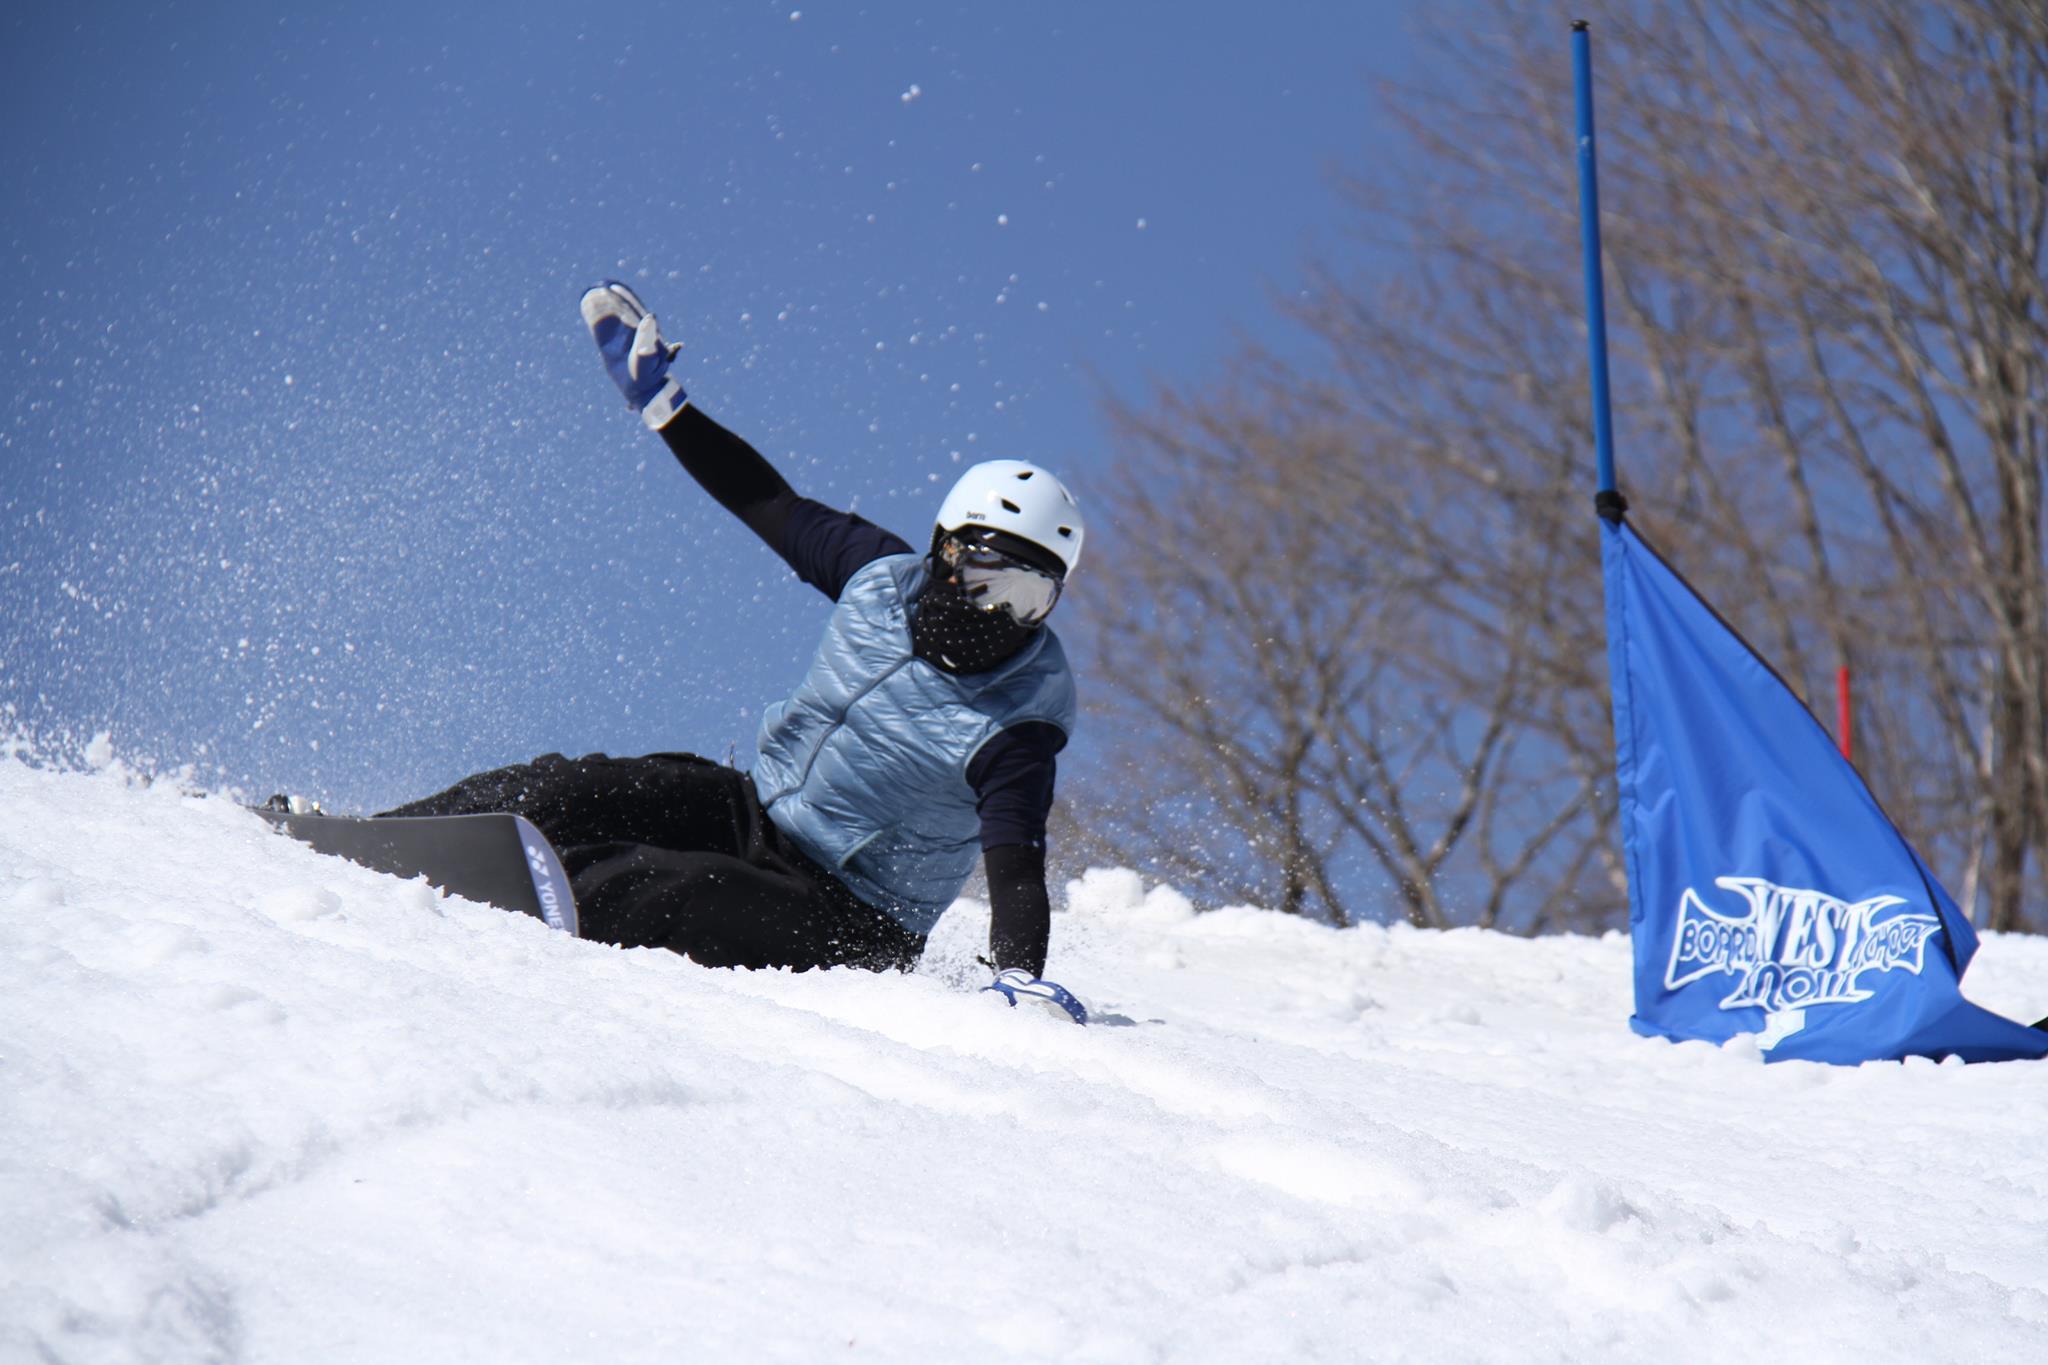 Sochi 2014 Olympics snowboard_e0115904_027420.jpg